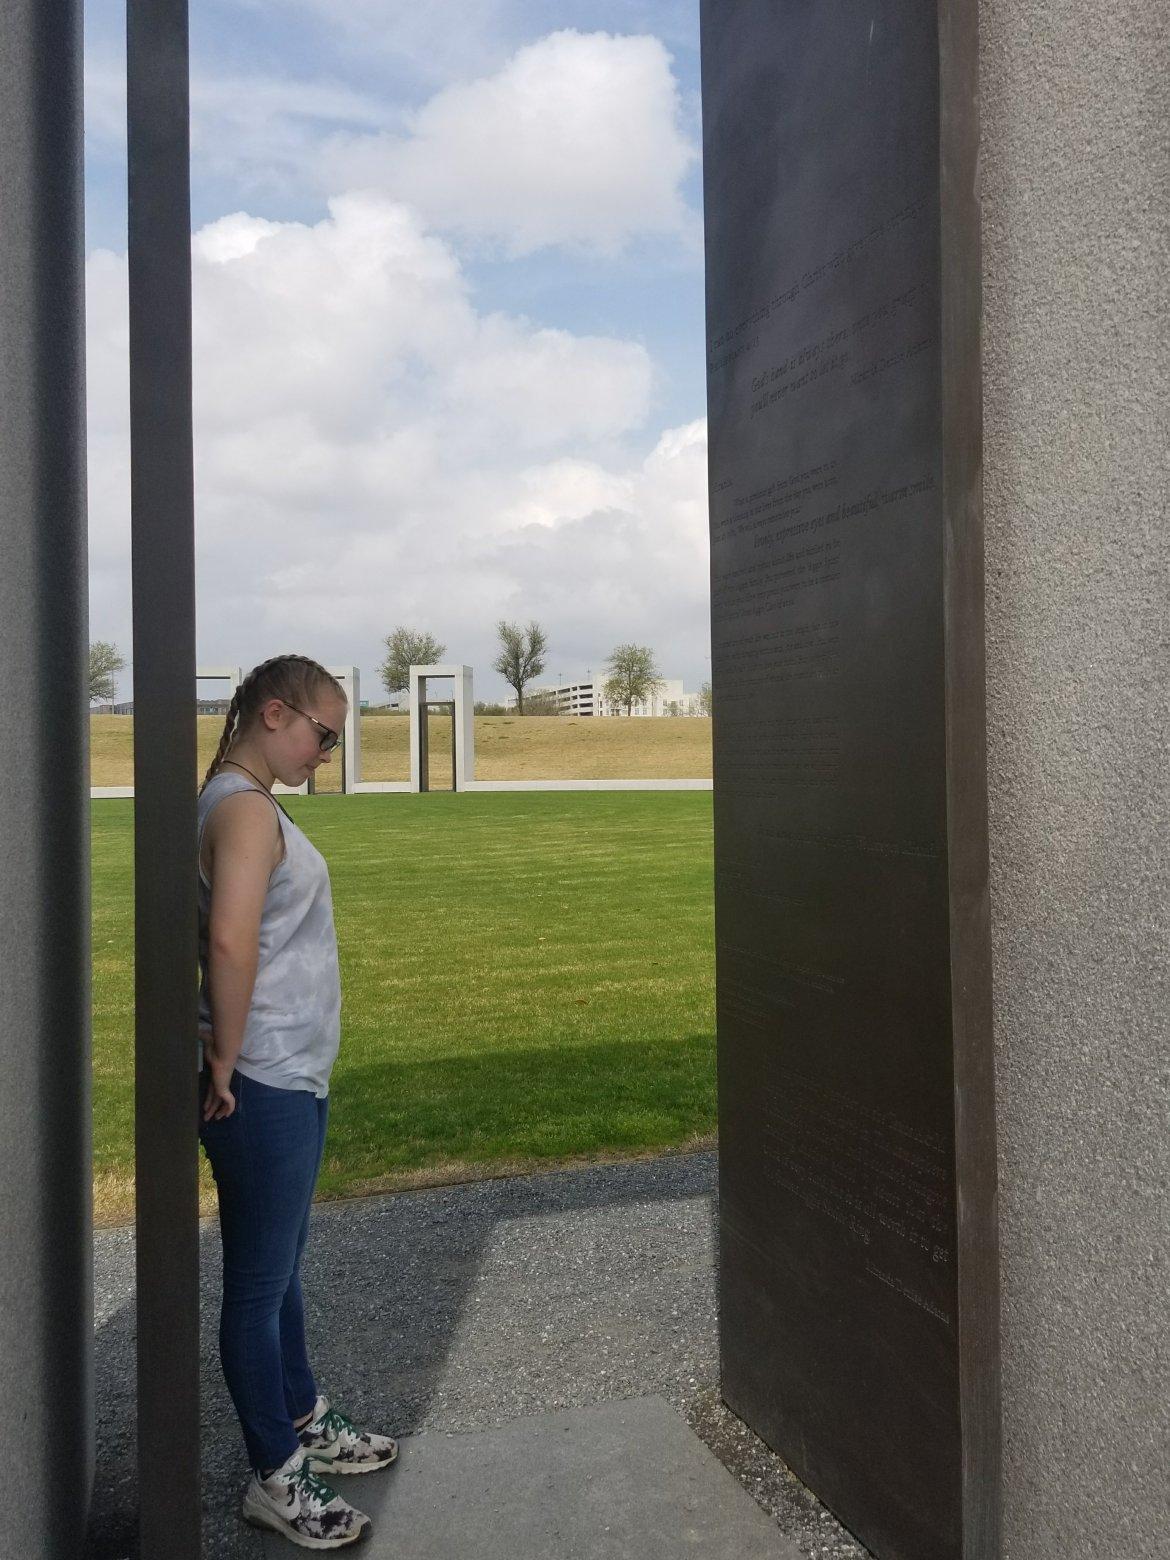 Aggie Bonfire Memorial at Texas A&M University